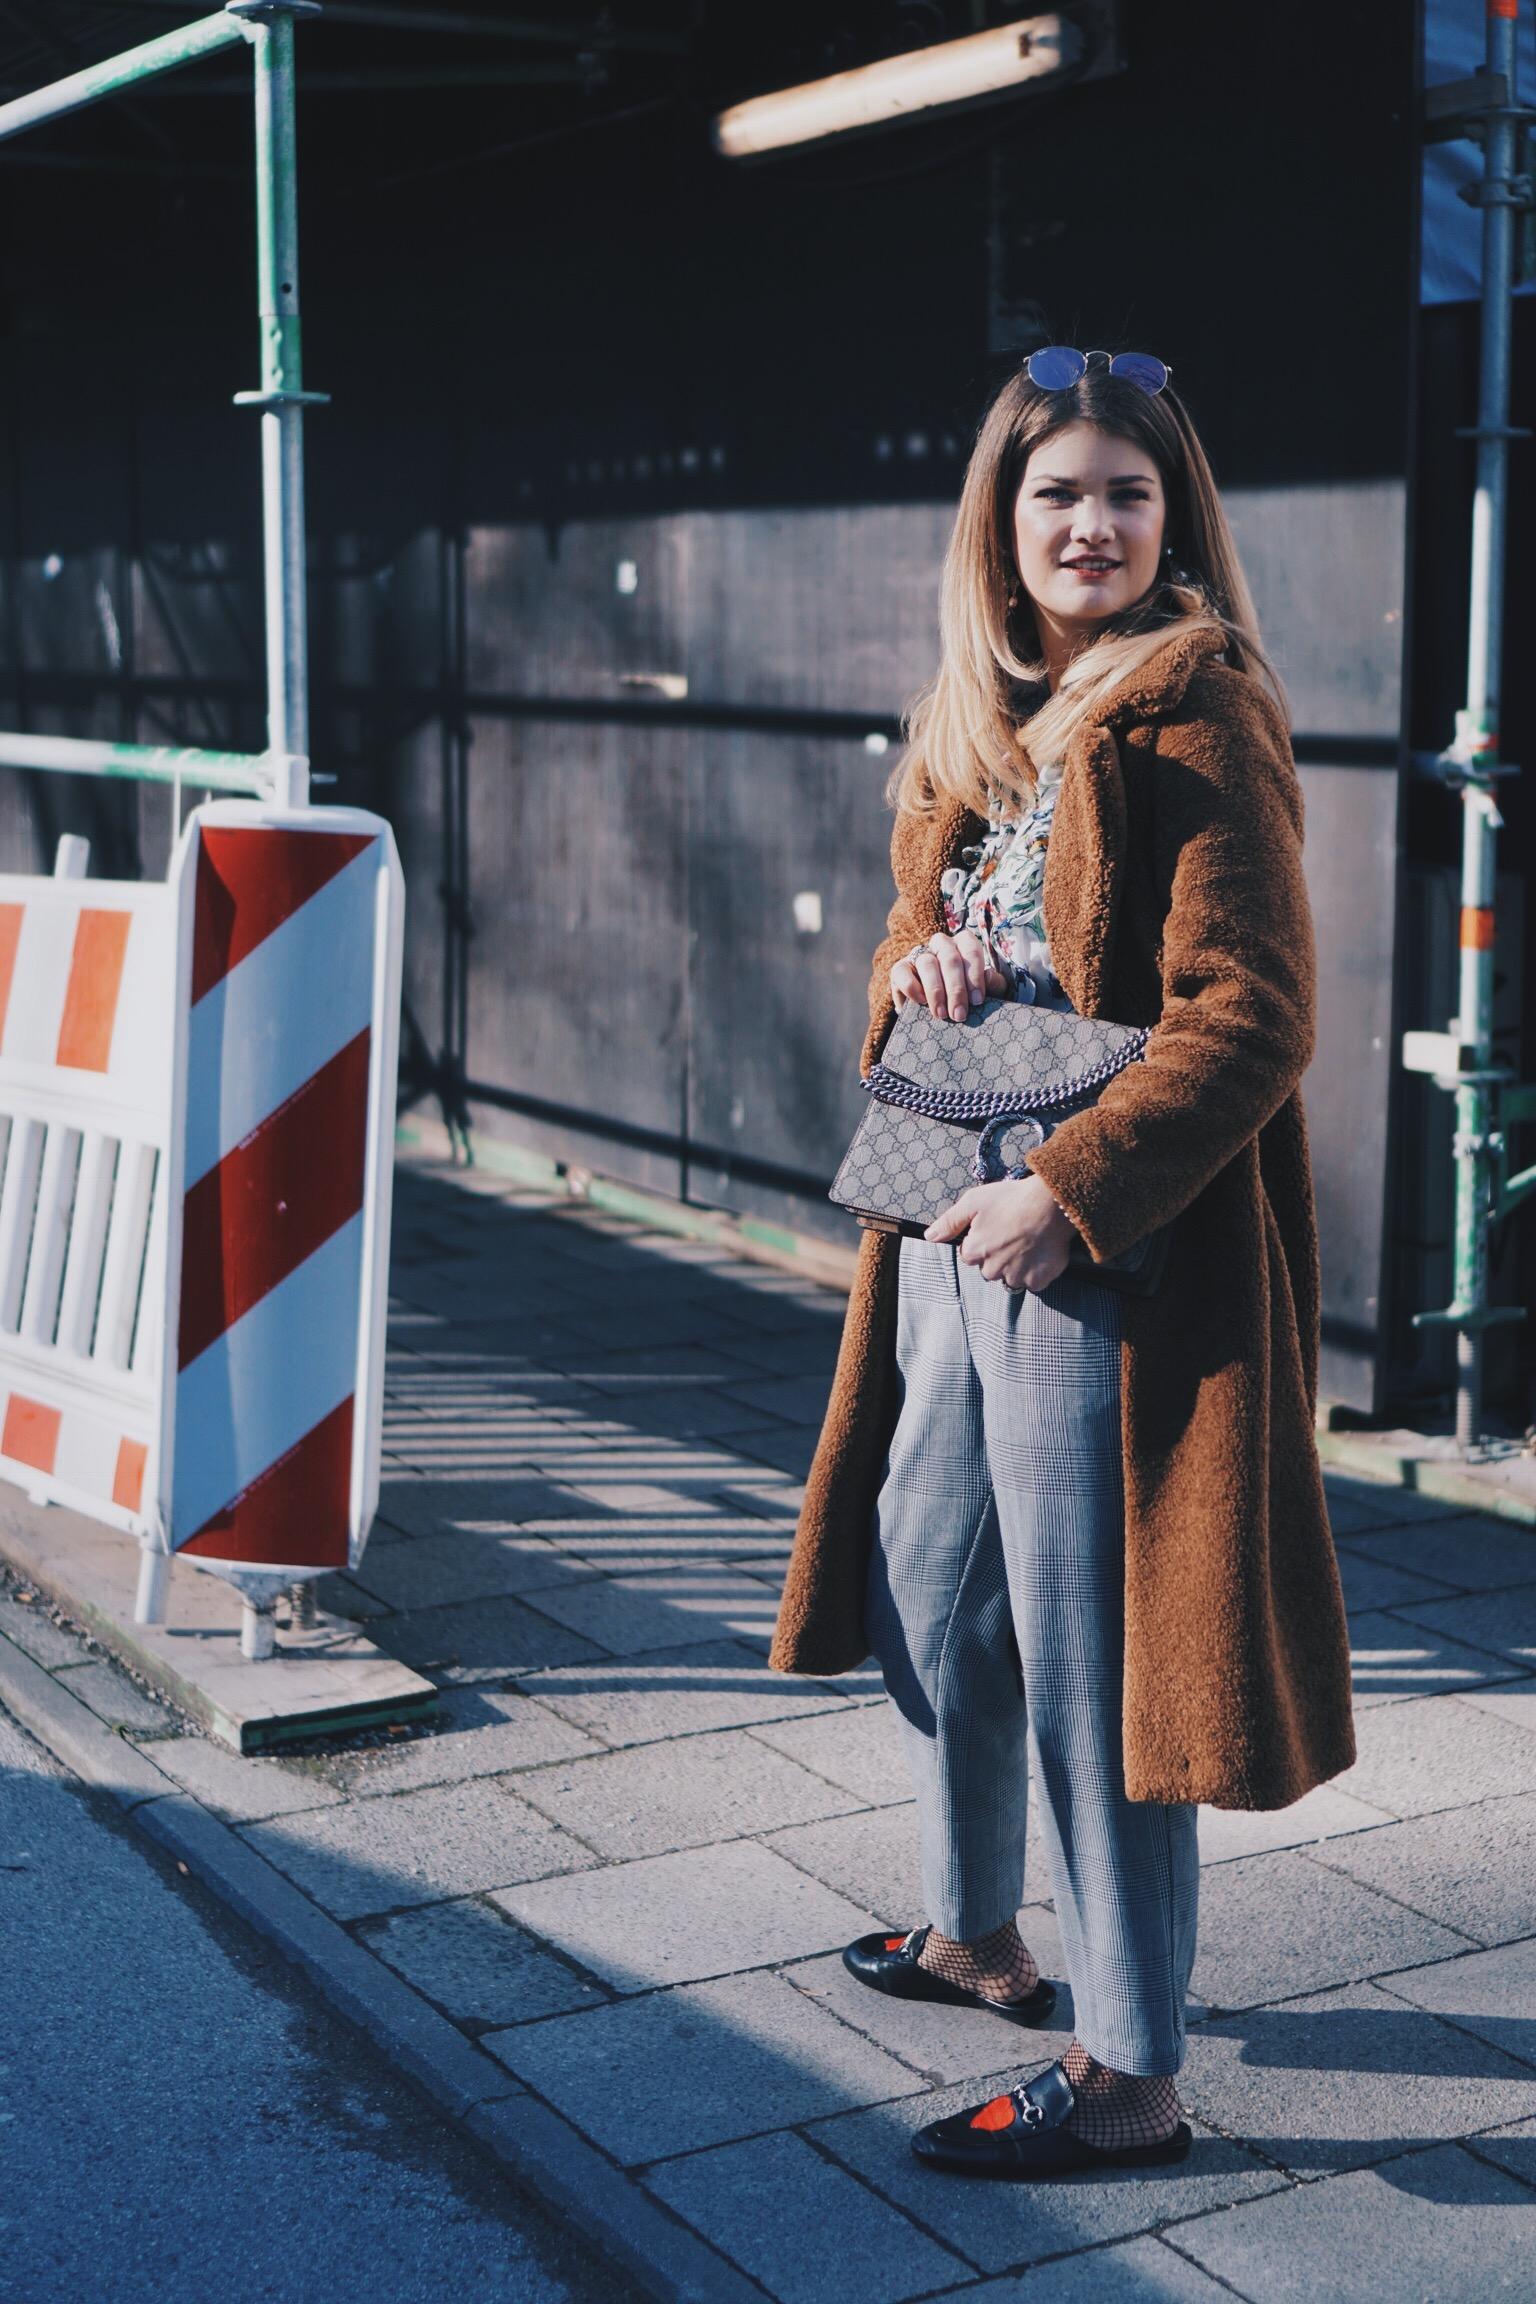 Streetstyle Italian Chic – Dresscode oder Lebensgefühl